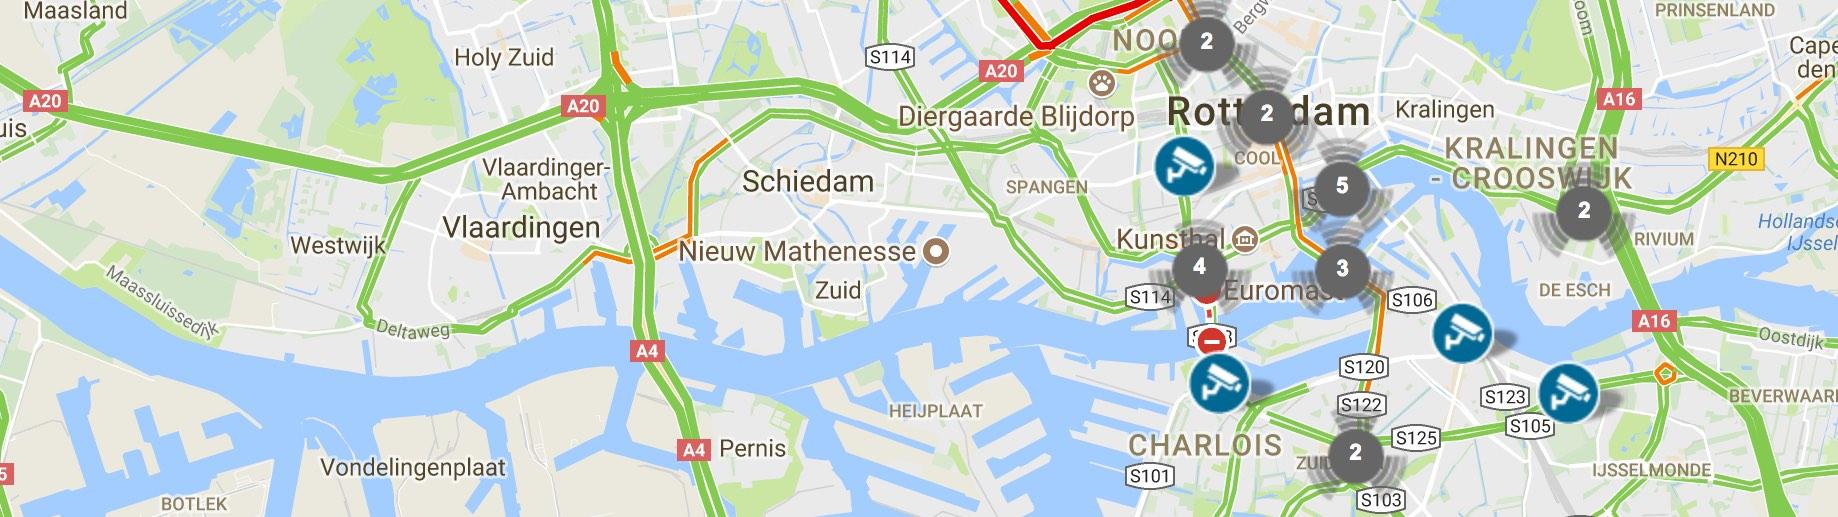 Volg live het Rotterdamse verkeer